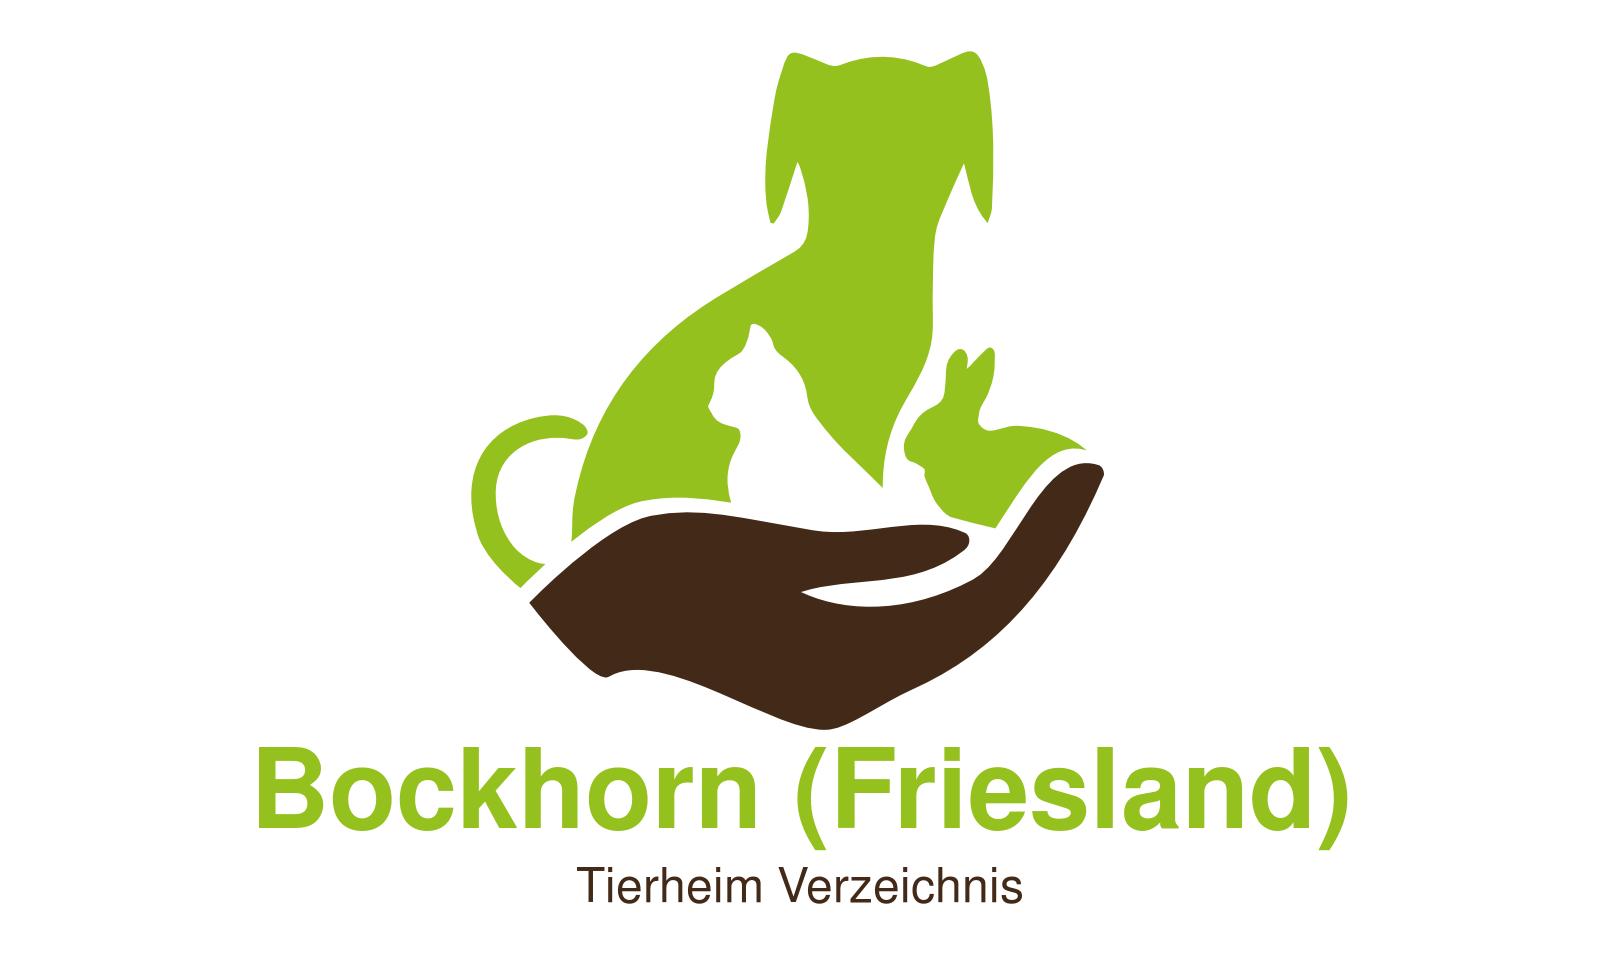 Tierheim Bockhorn (Friesland)